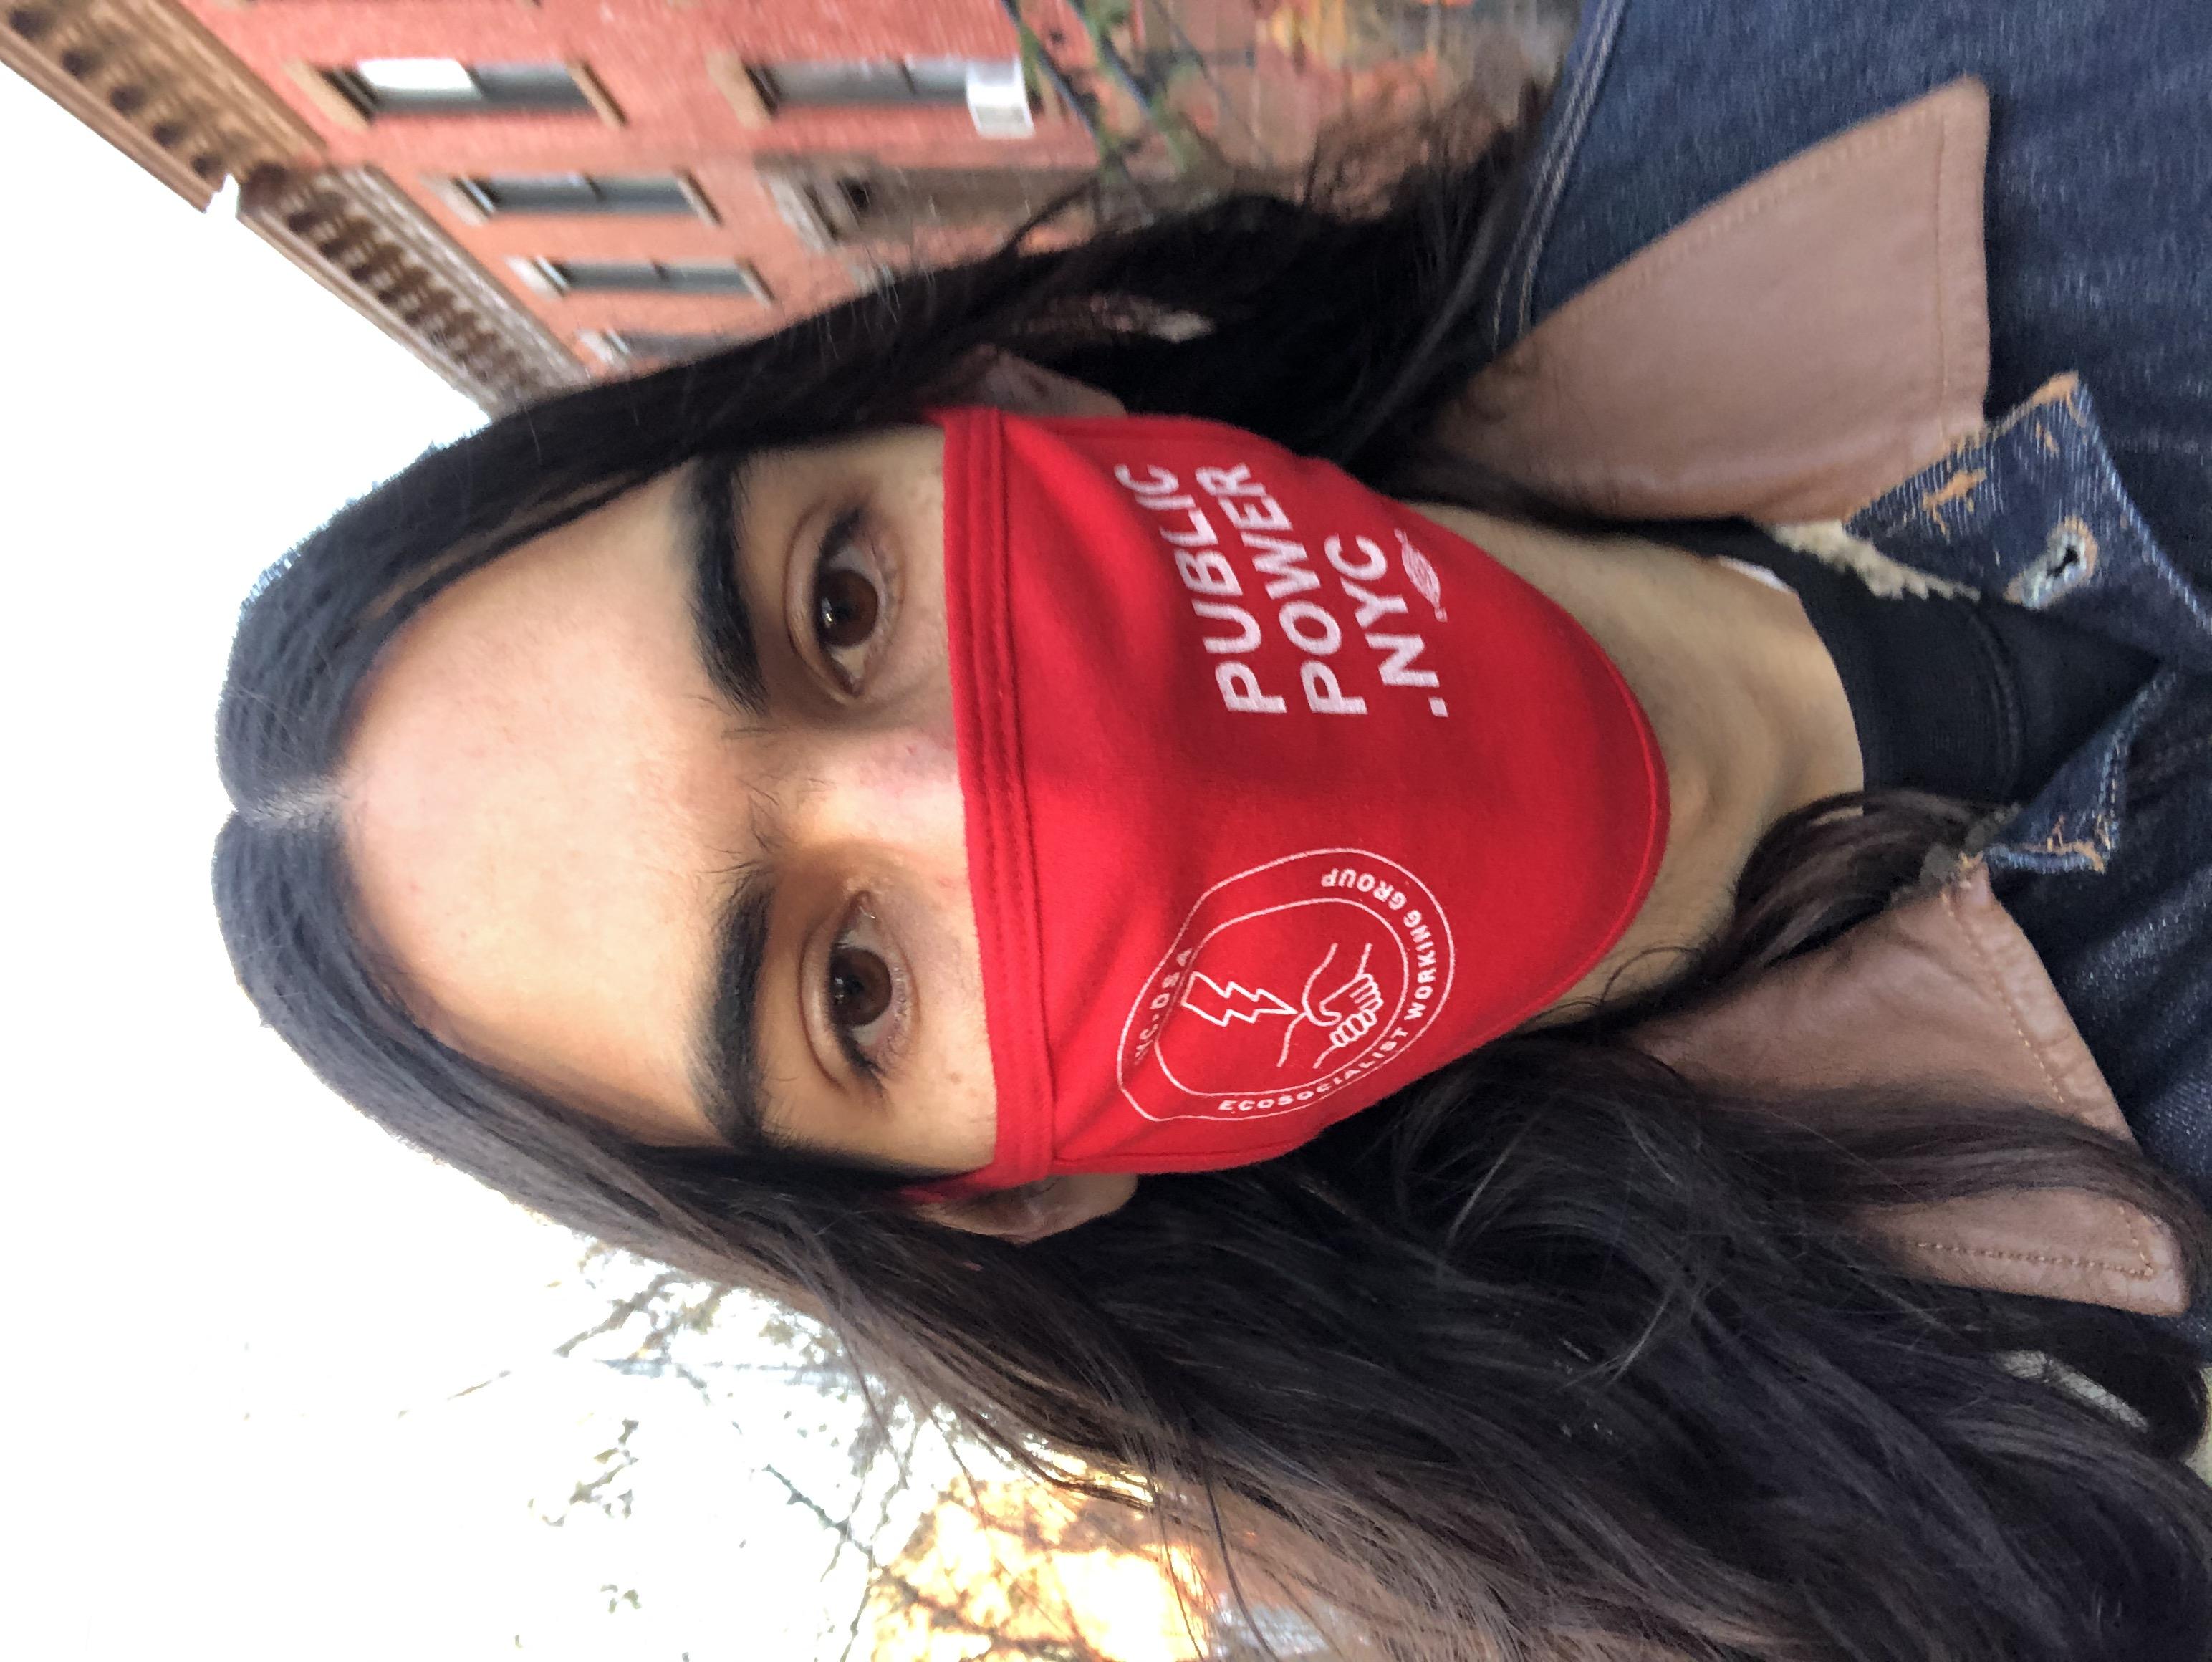 Gustavo Gordillo, Activist, Democratic Socialists of America